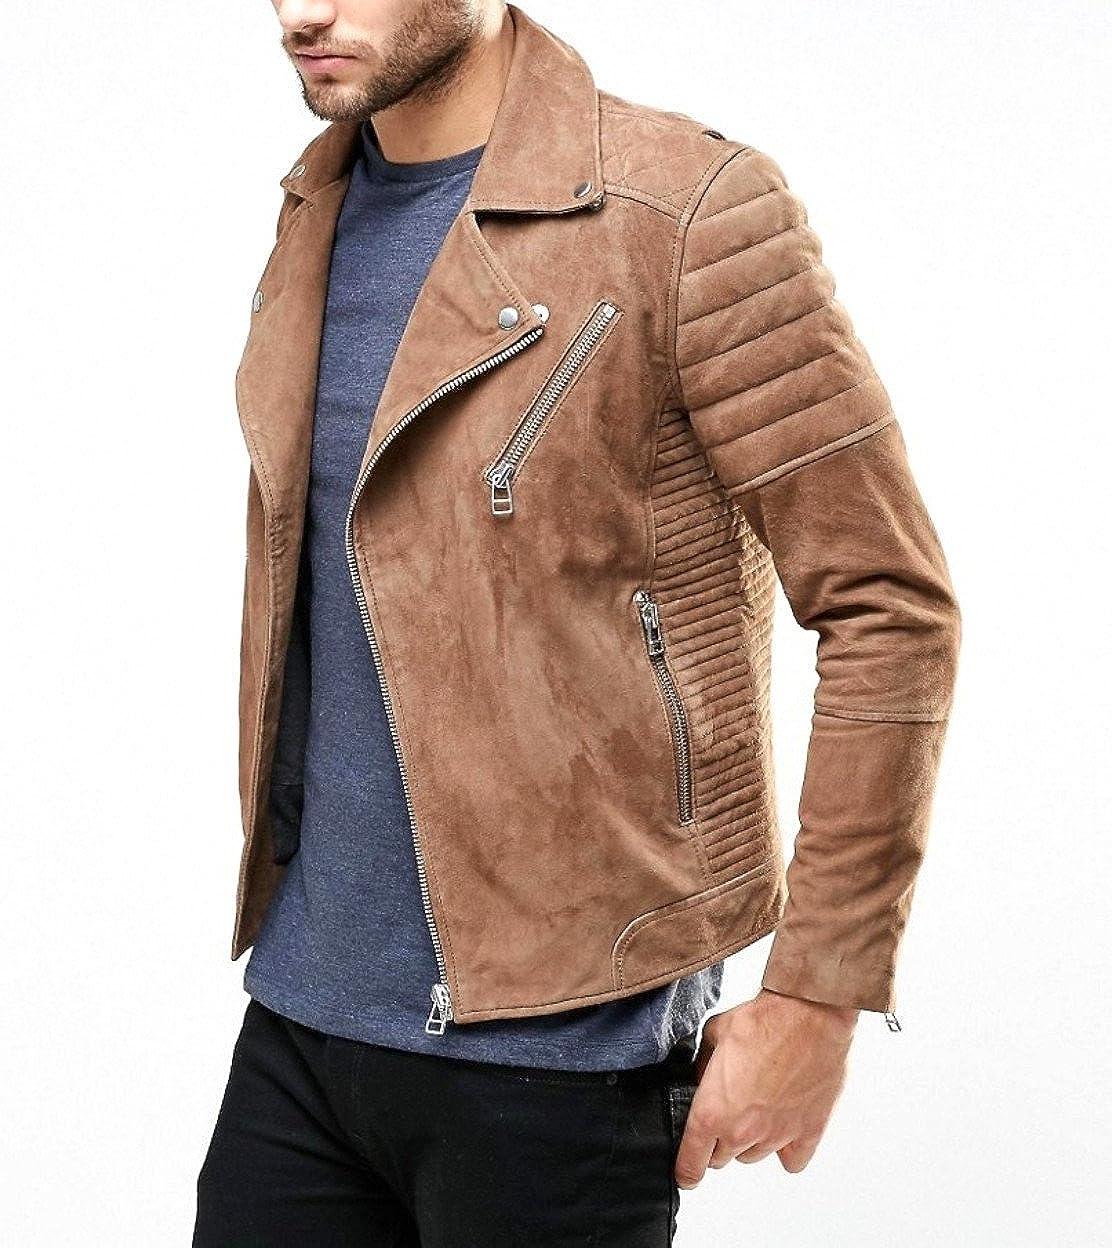 World of Leather Genuine Lambskin Suede Leather Jacket Biker Light Brown Moto